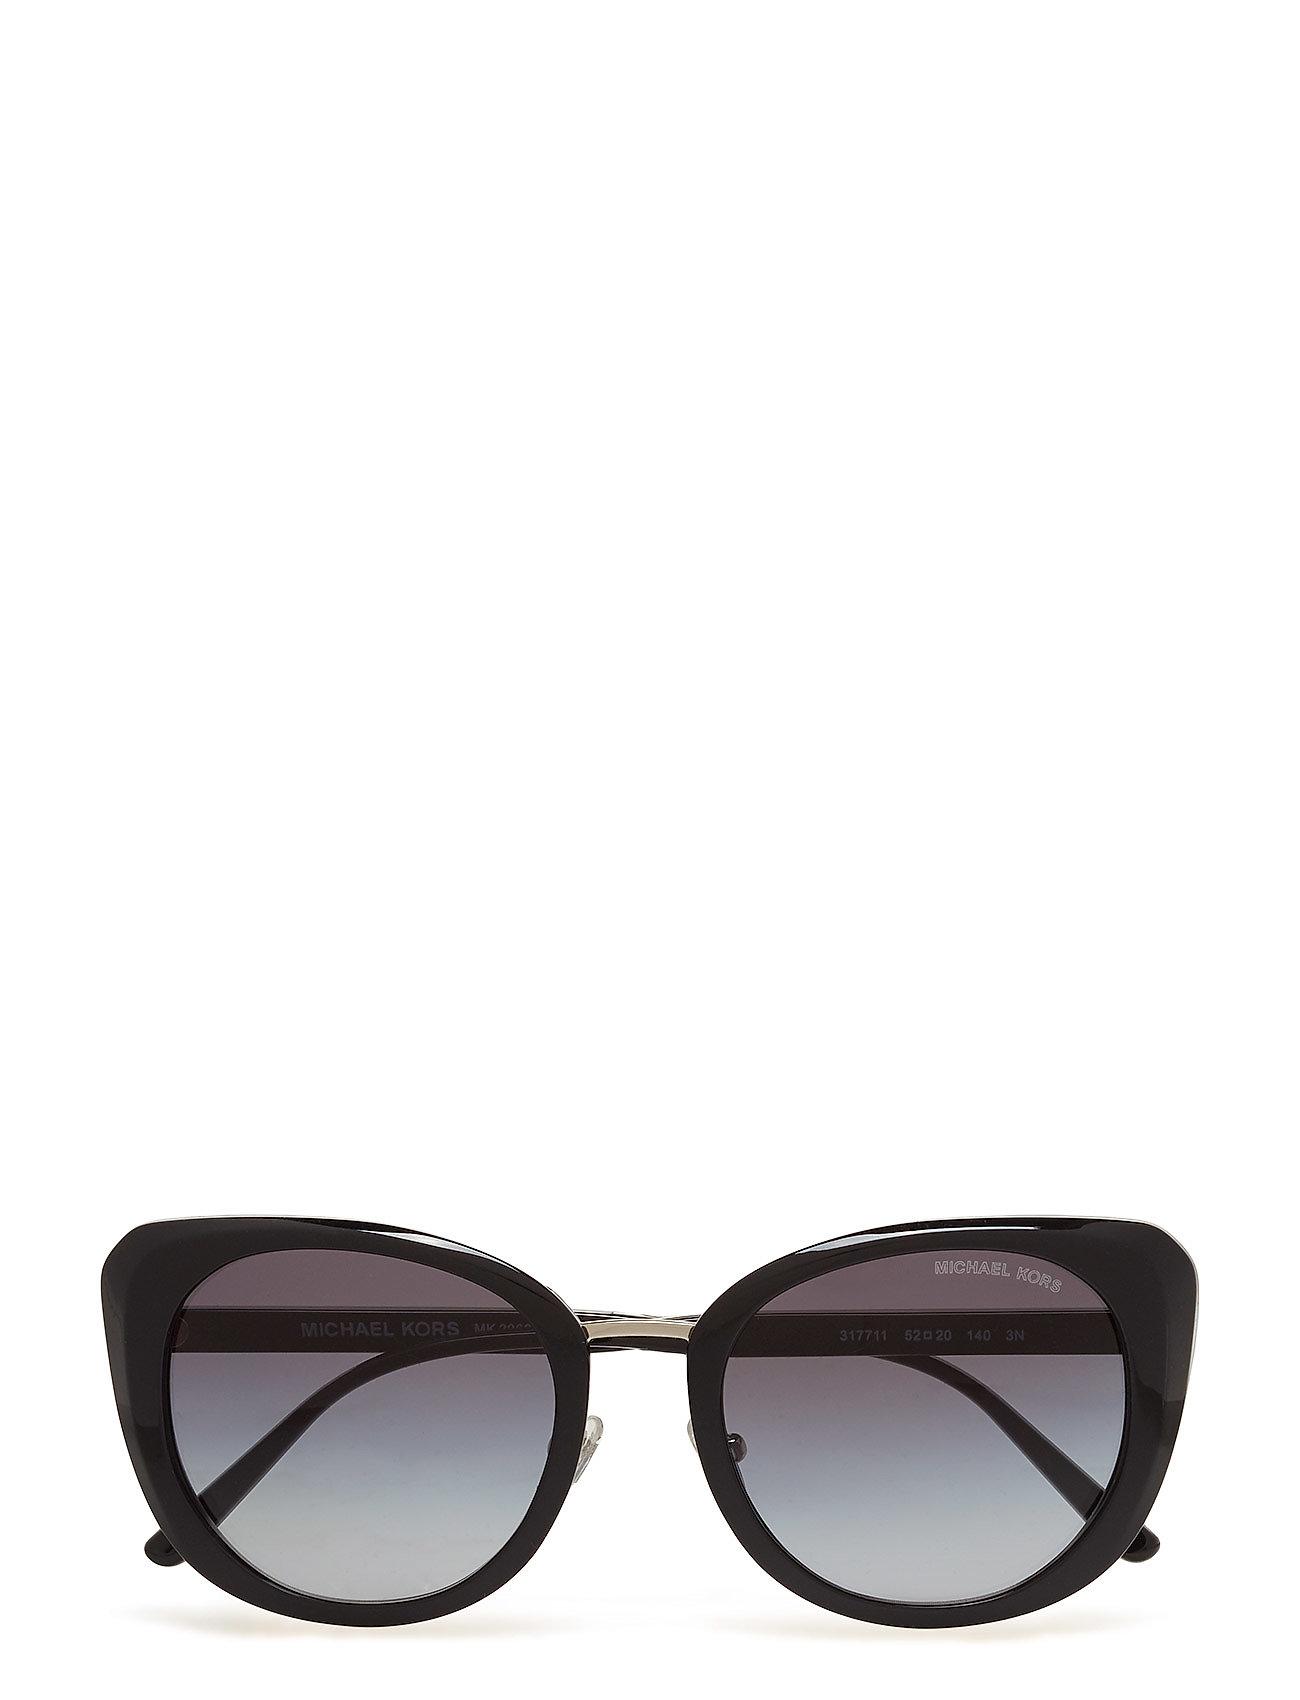 1a03a565196 Sort Michael Kors Lisbon solbriller for dame - Pashion.dk